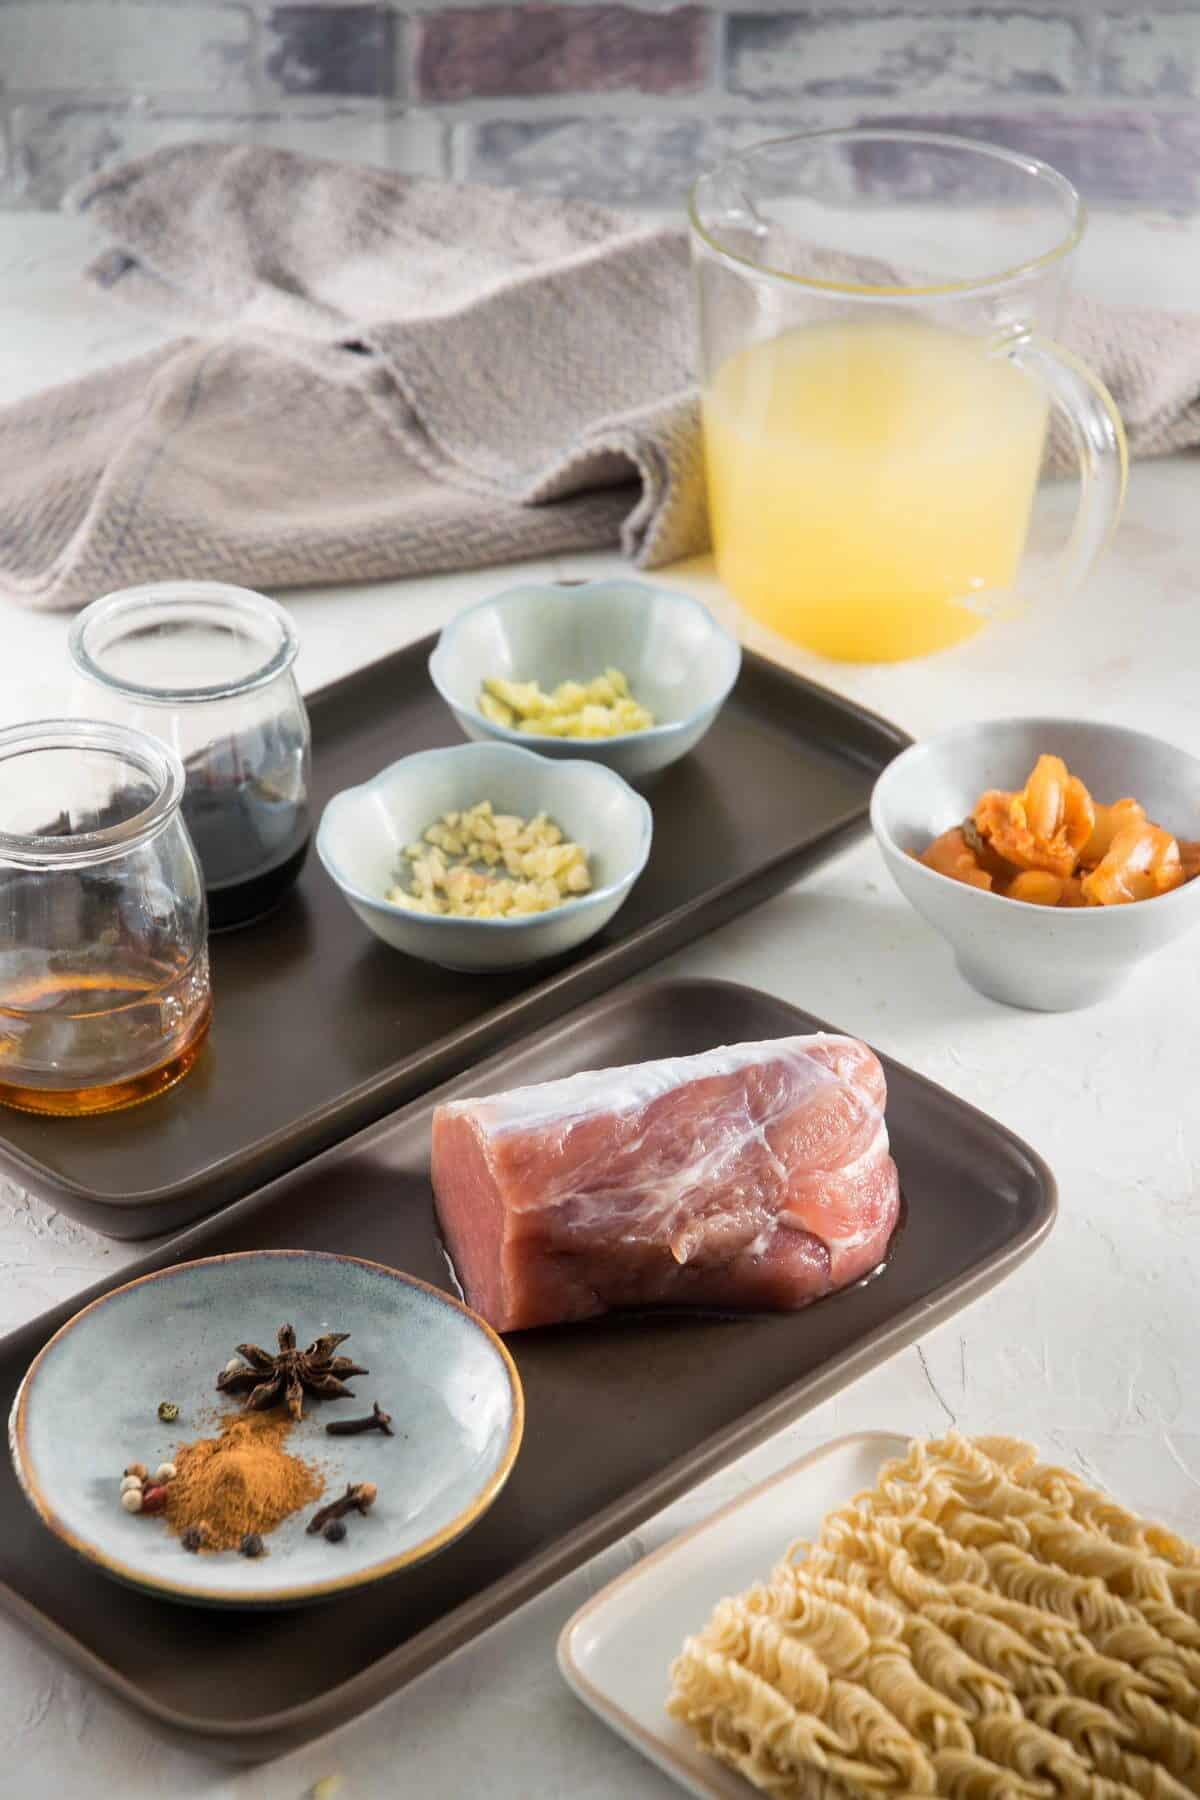 Kimchi ramen ingredients prepped on light background.